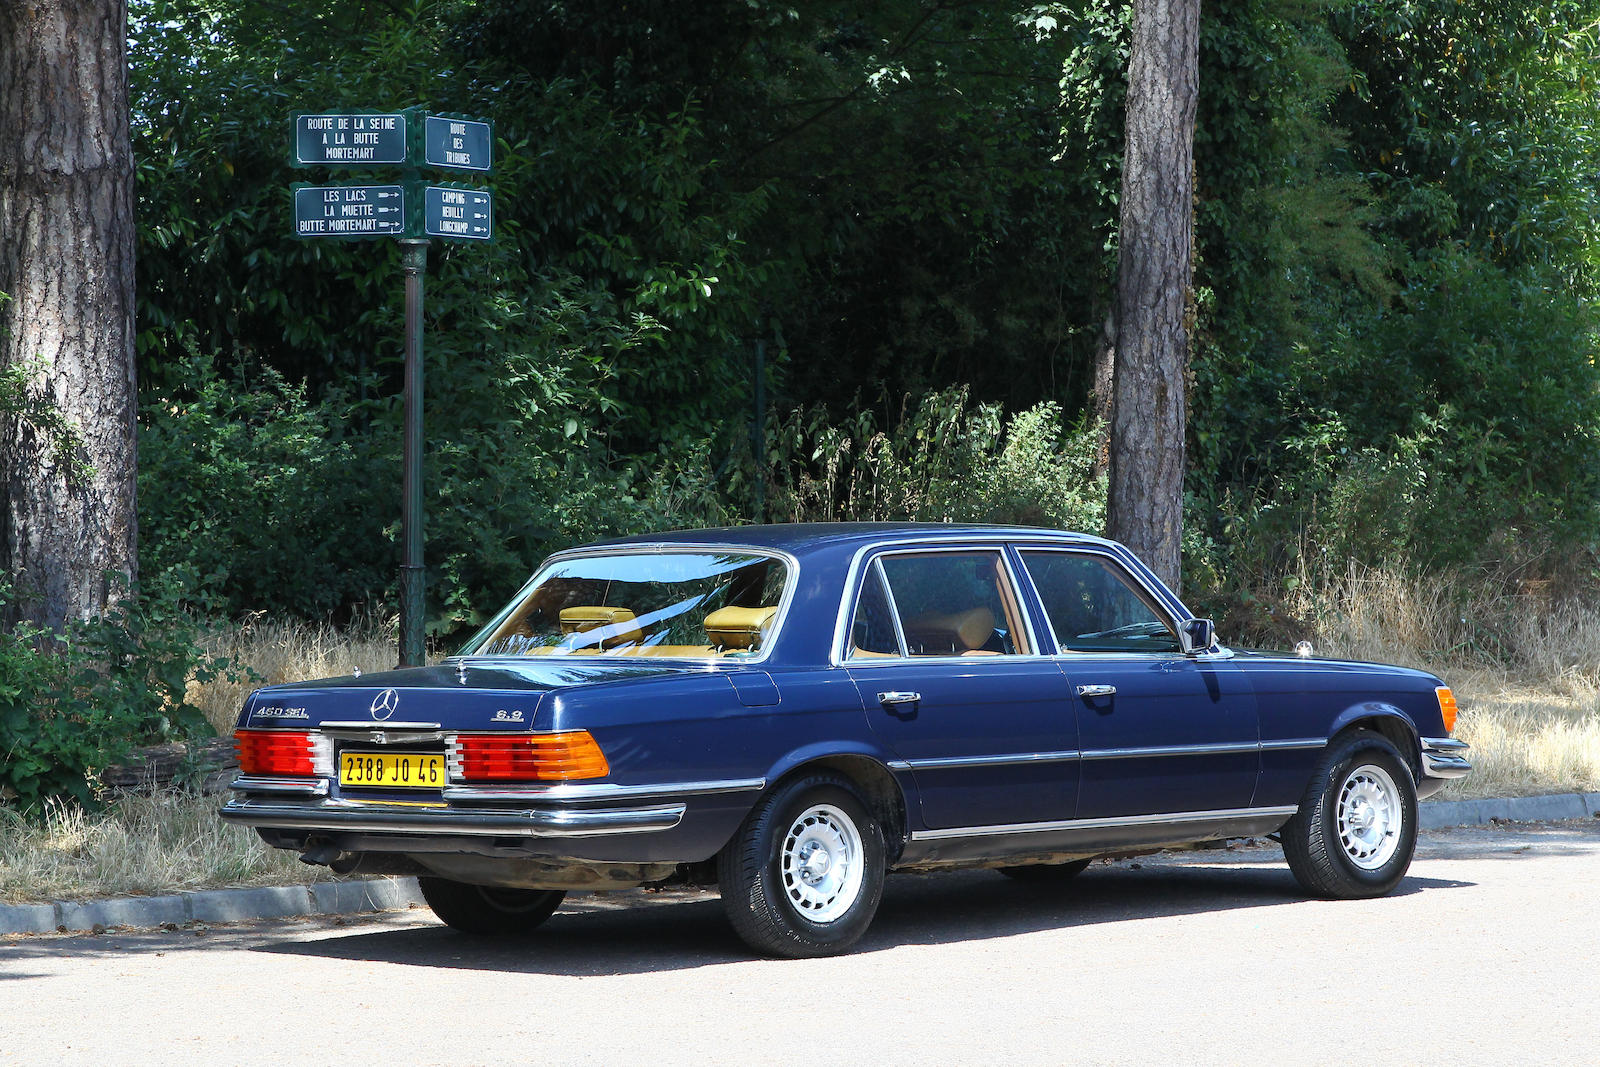 Mercedes 450 sel 6 9 1976 sprzedany gie da klasyk w for Mercedes benz 450 sel 6 9